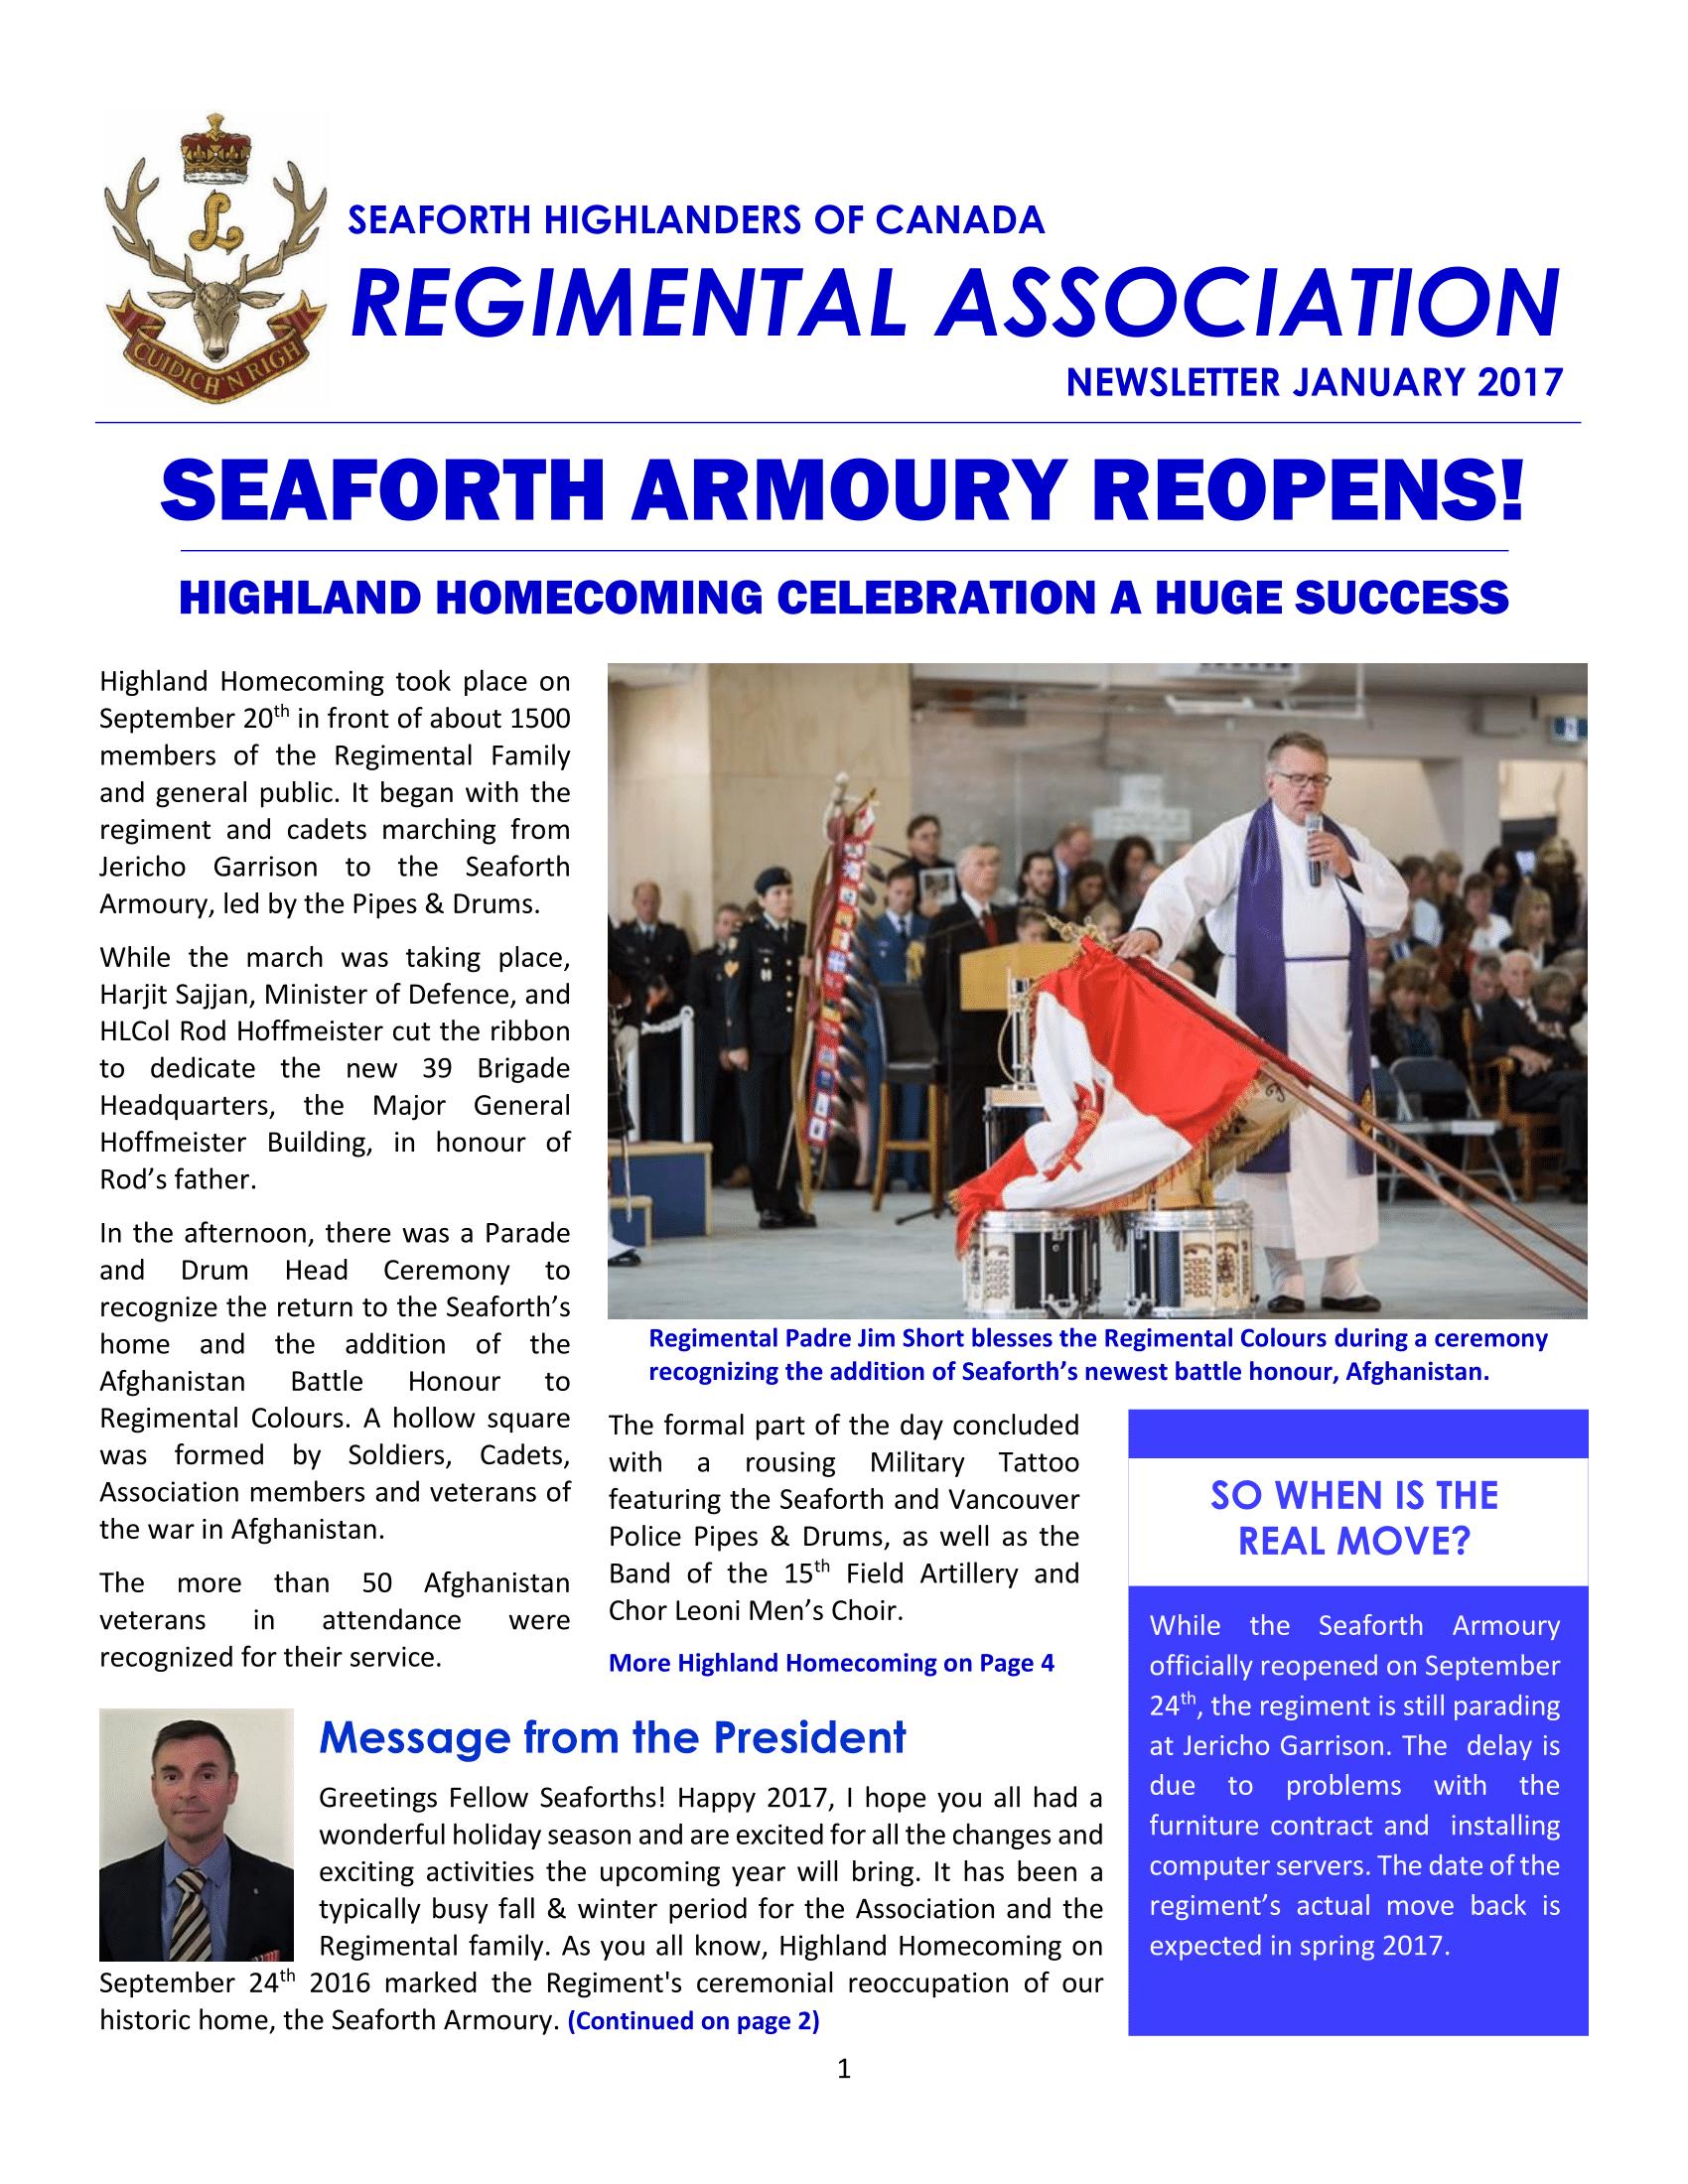 Association Newsletter January 2017-1.png